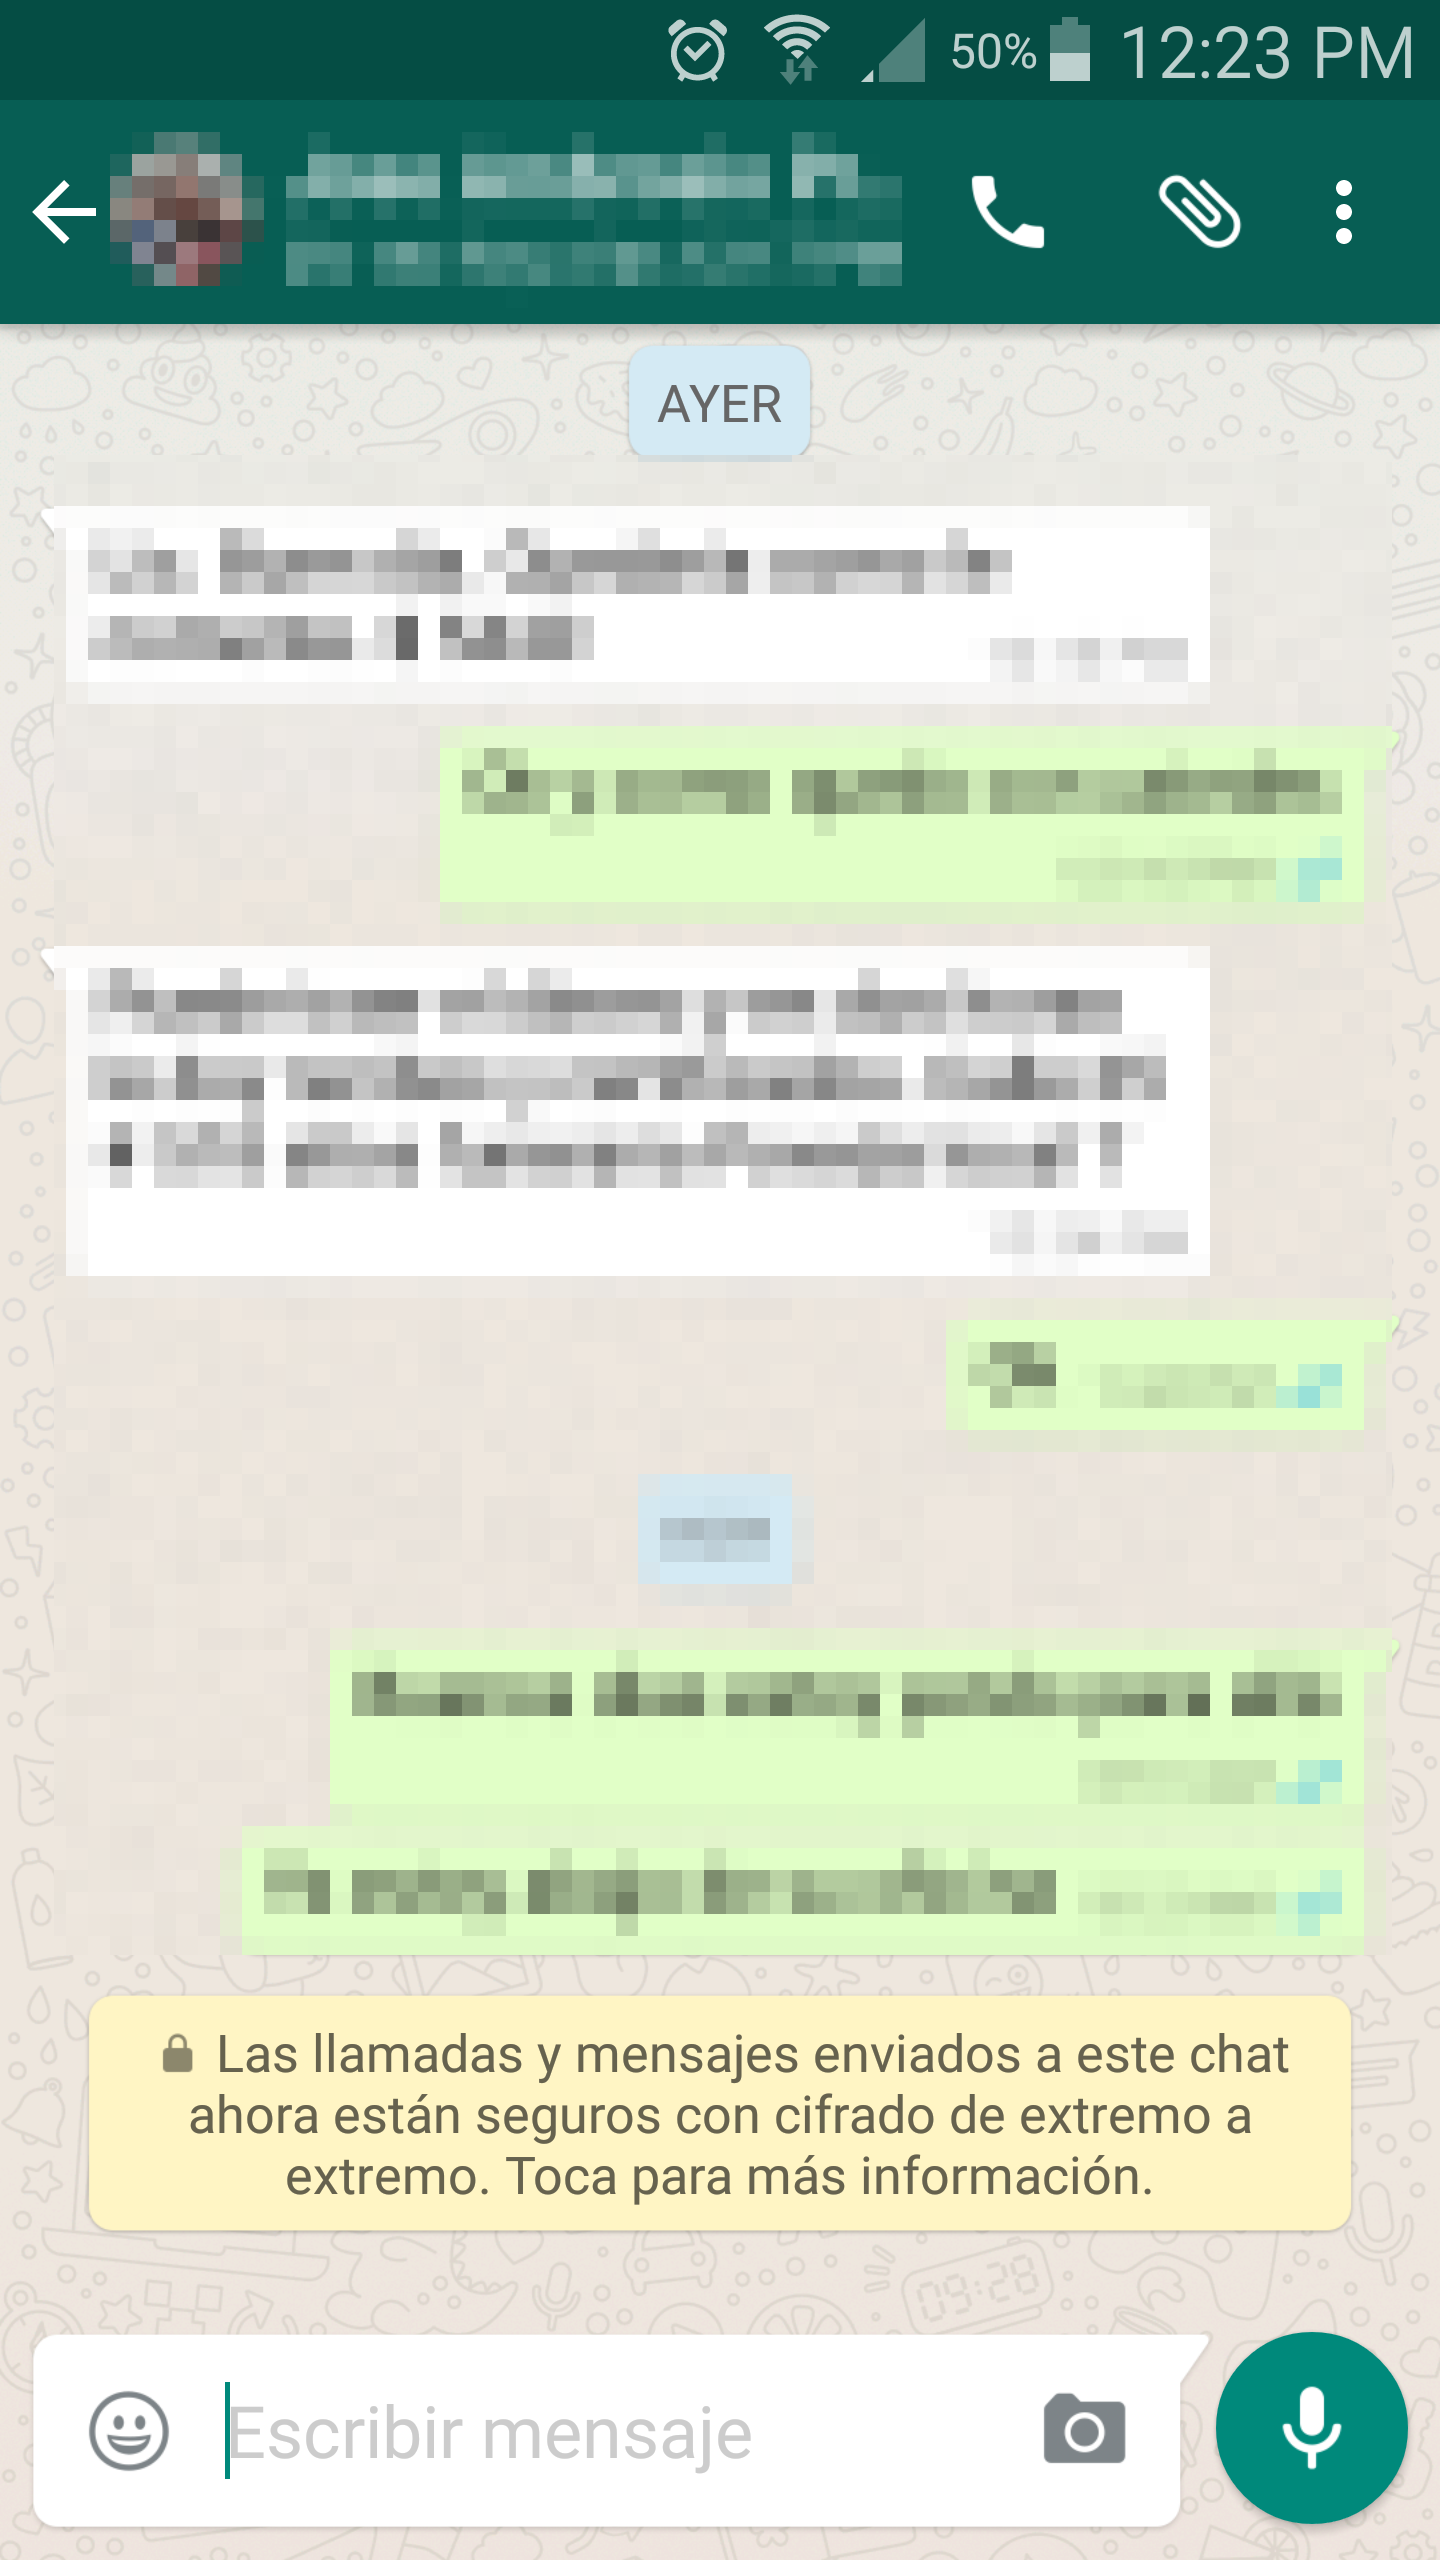 Whatsapp-cifrado-extremo-a-extremo-1